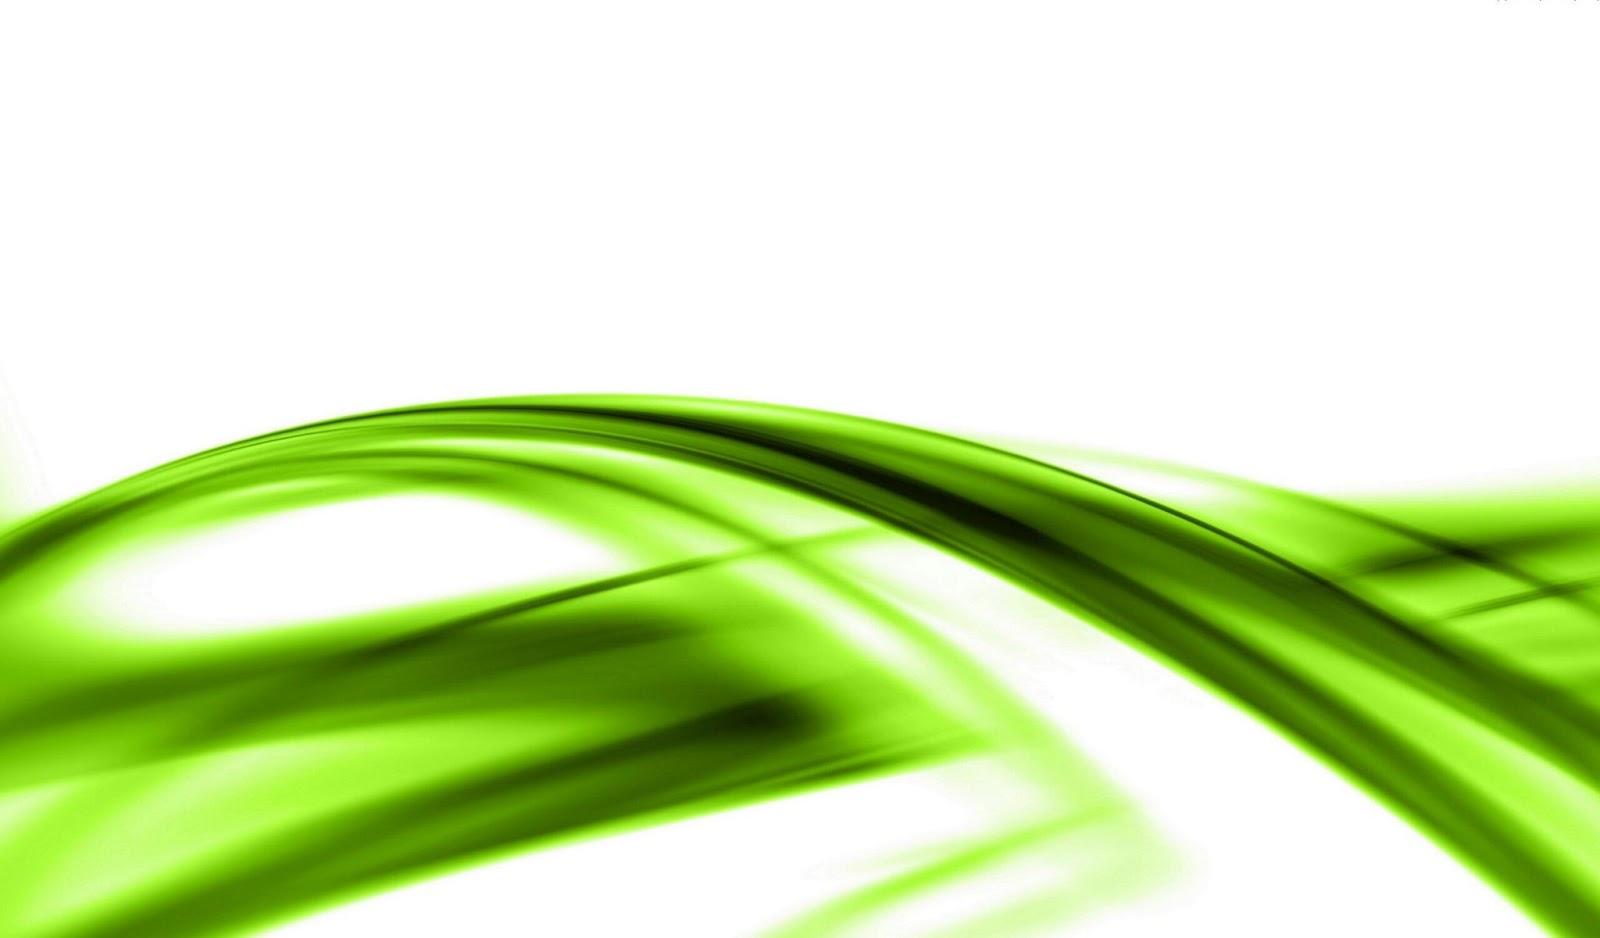 Licht groene abstracte achtergrond hd wallpapers - Wallpaper amandelgroene ...